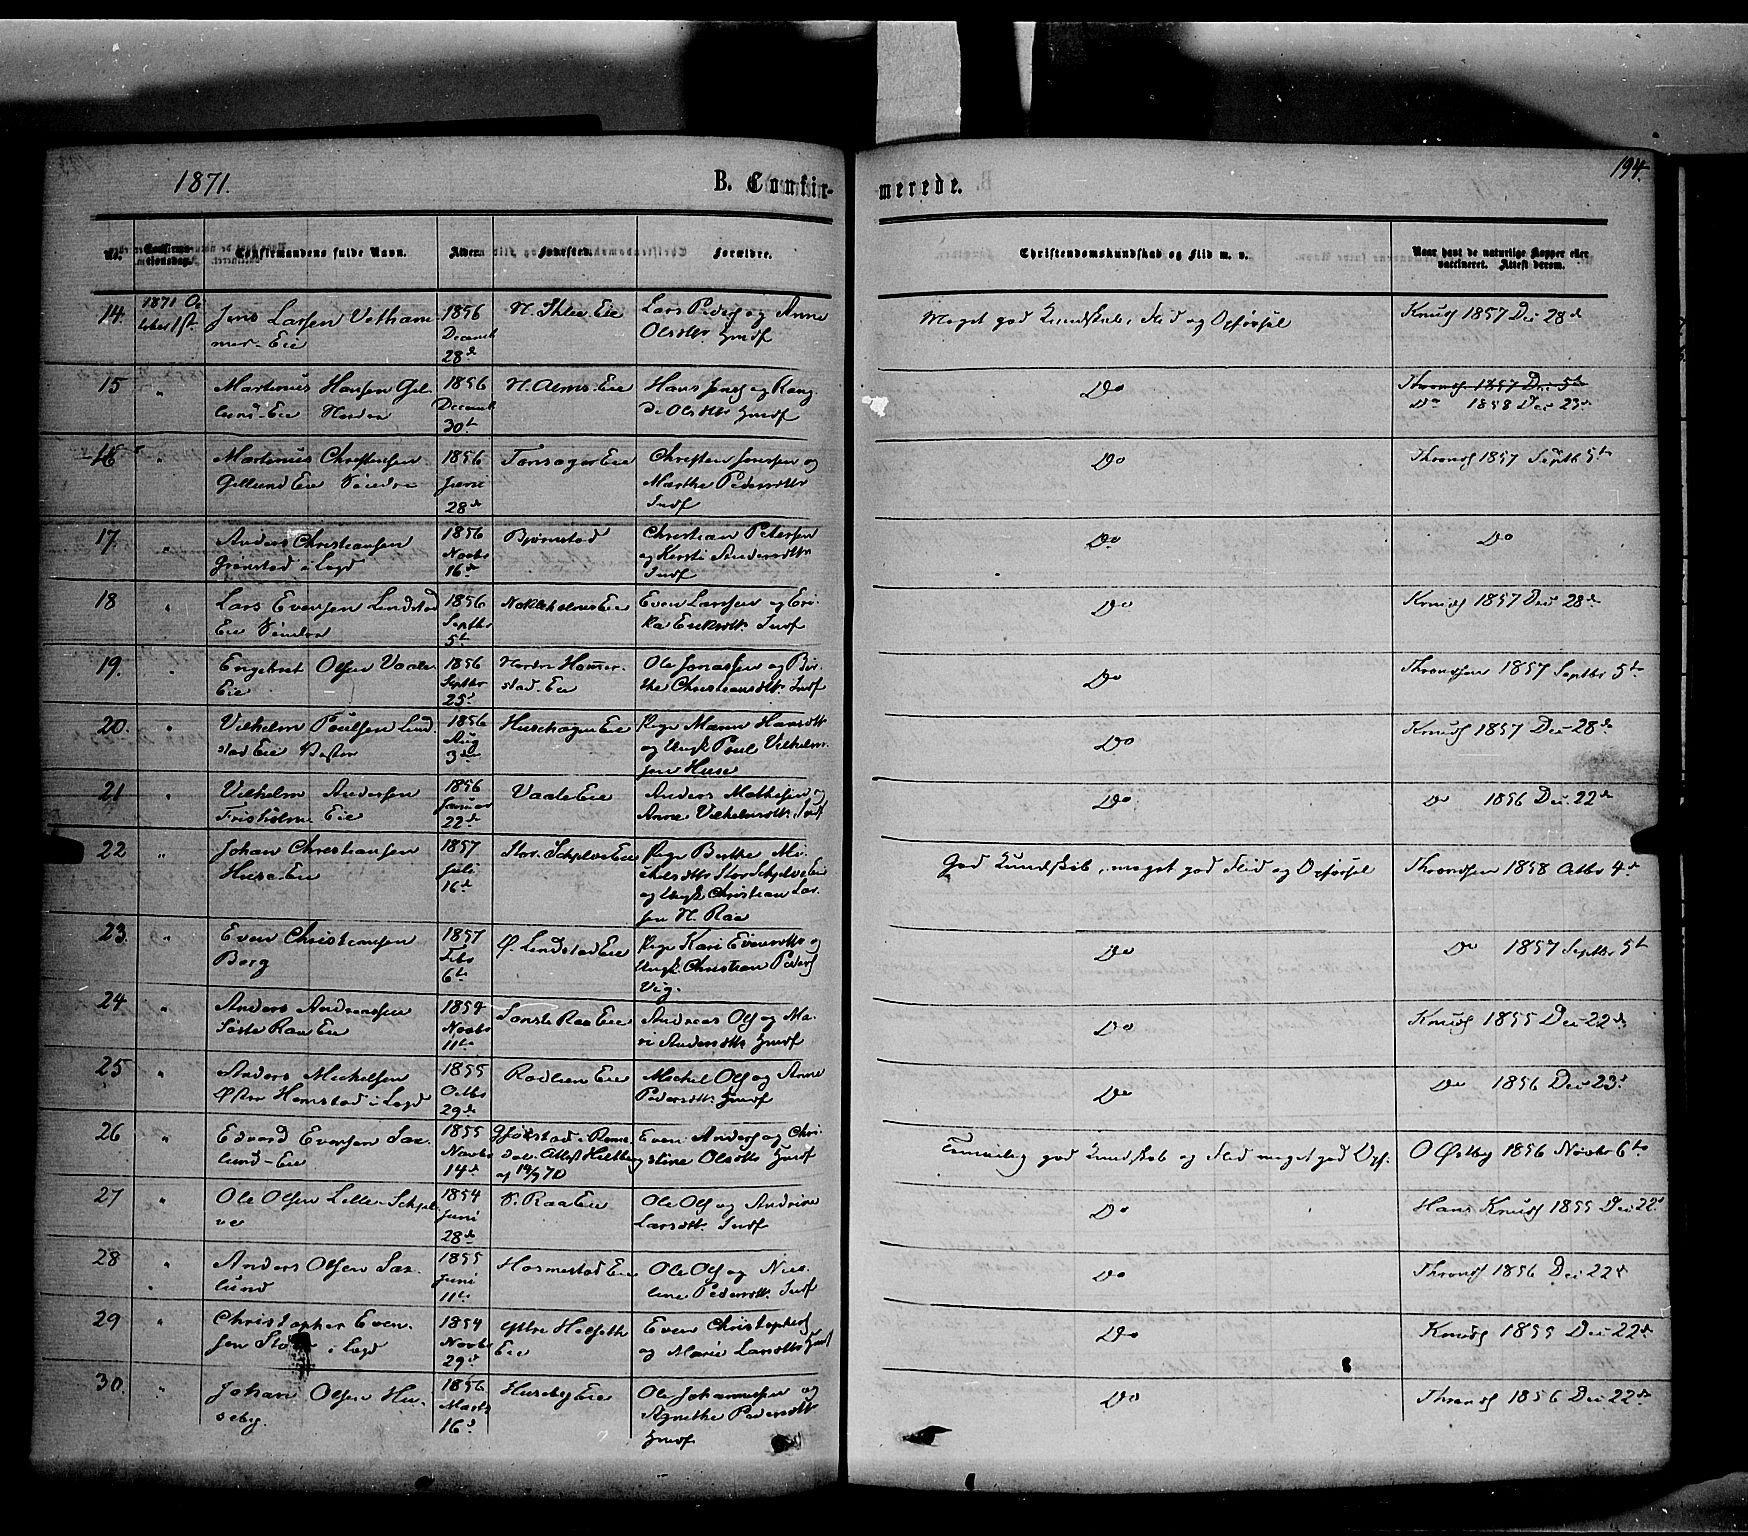 SAH, Stange prestekontor, K/L0013: Ministerialbok nr. 13, 1862-1879, s. 194